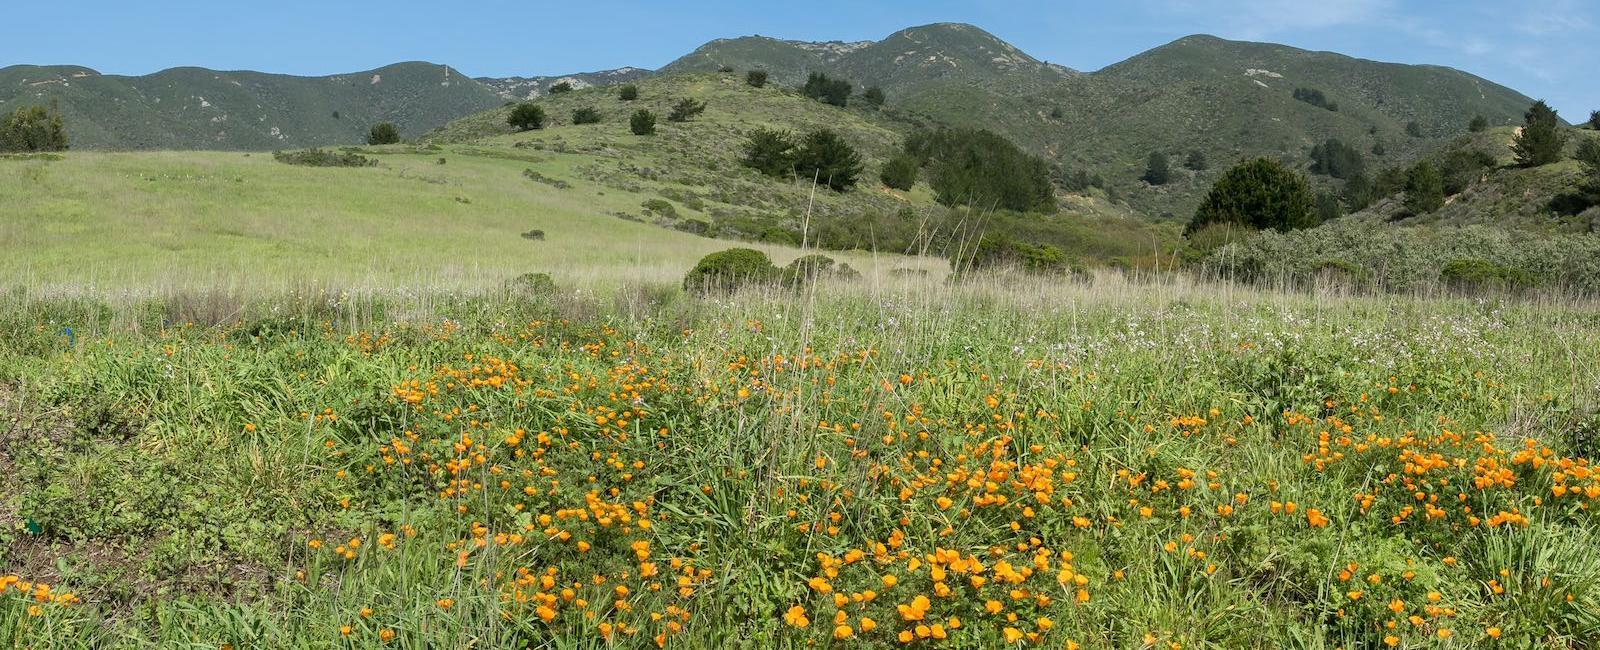 A sunny day at Rancho Corral de Tierra